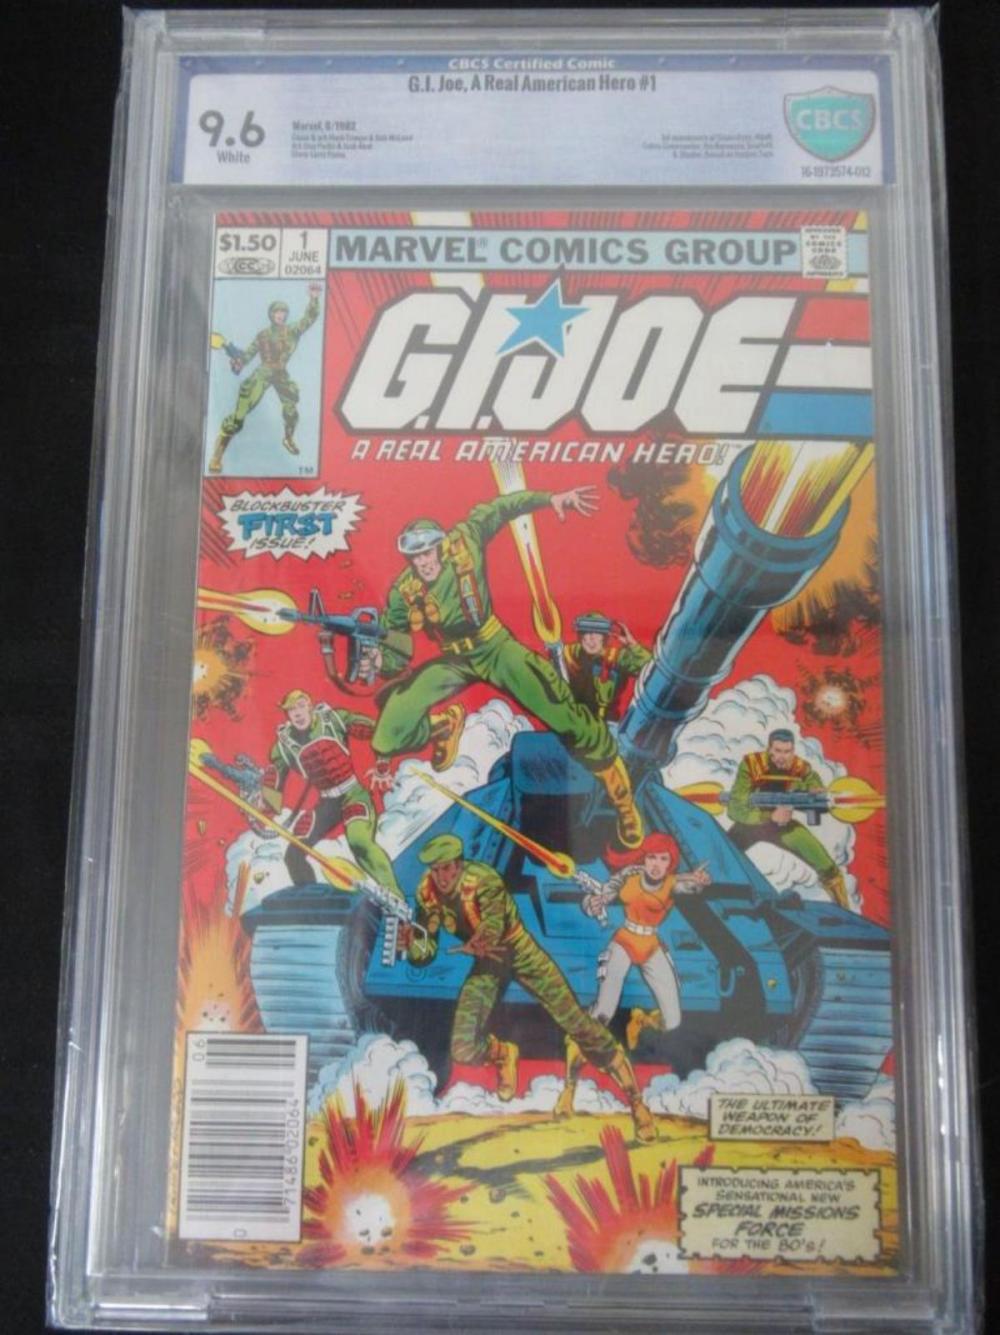 G.I. Joe, A Real American Hero #1 CBCS 9.6